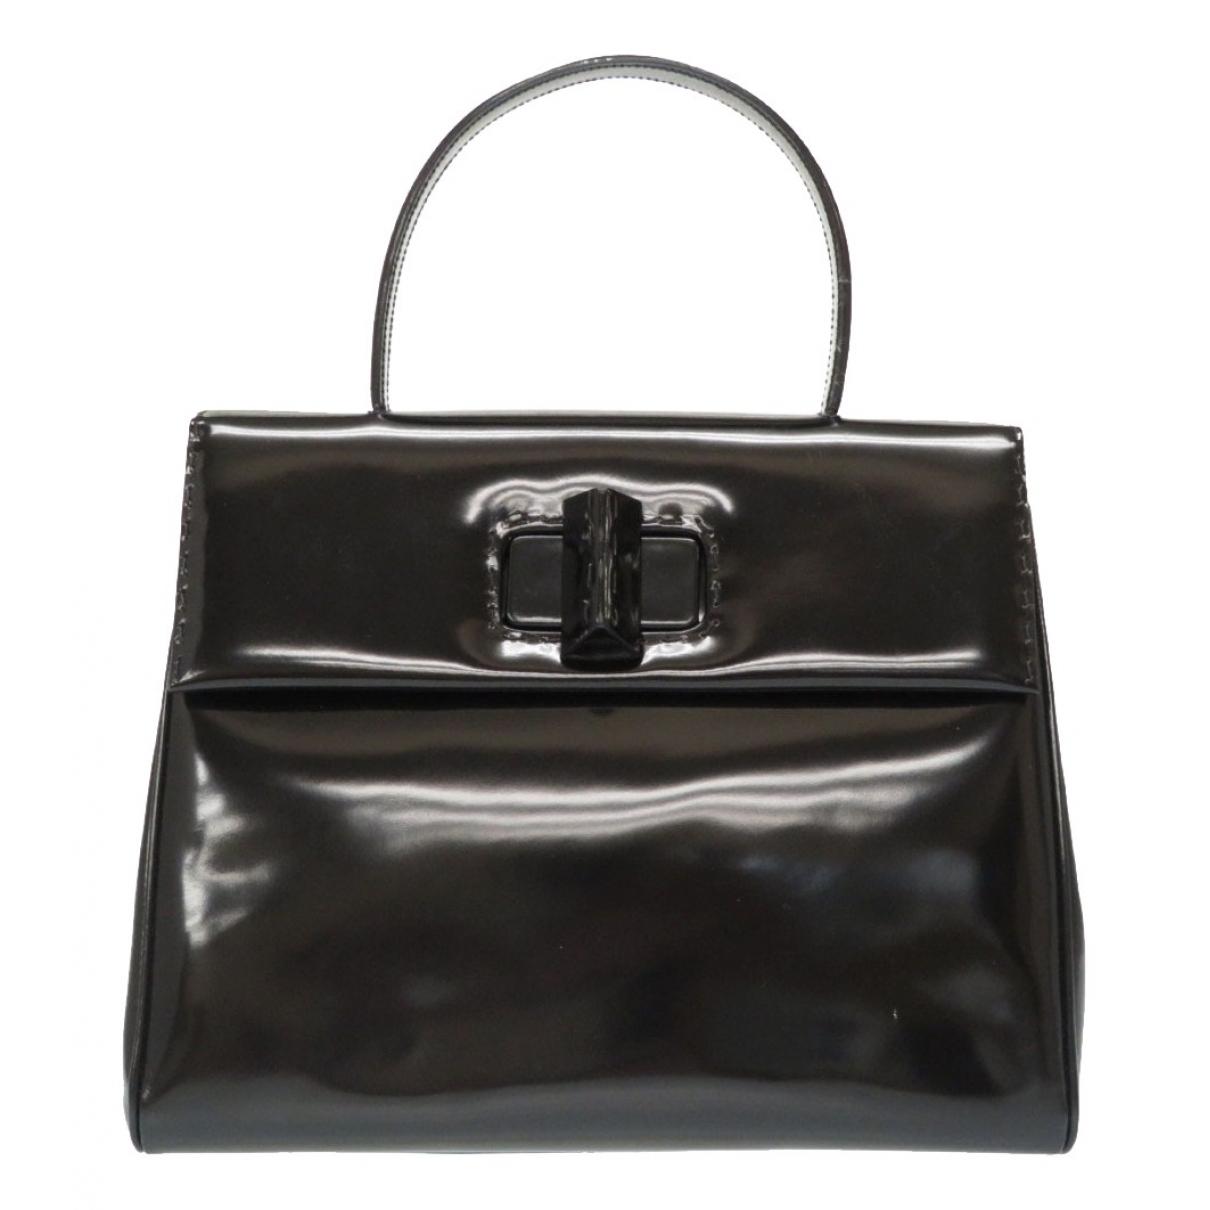 Prada \N Black Patent leather handbag for Women \N